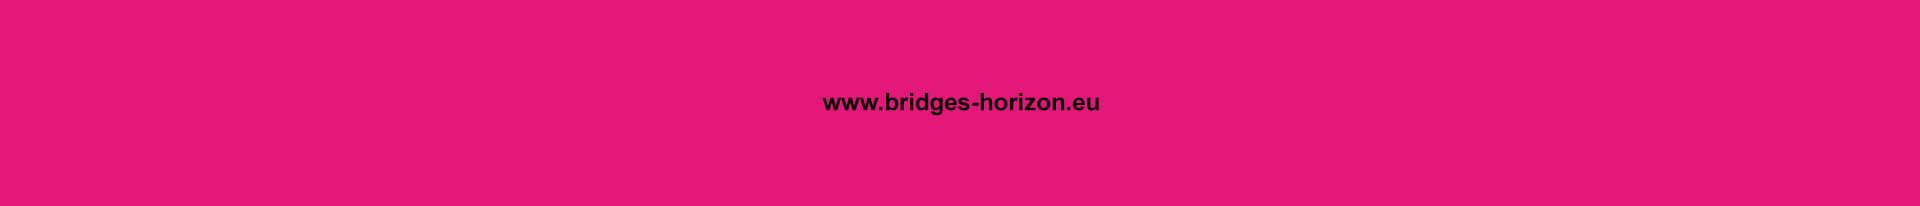 zerouno-design-Bridges-horizon-link